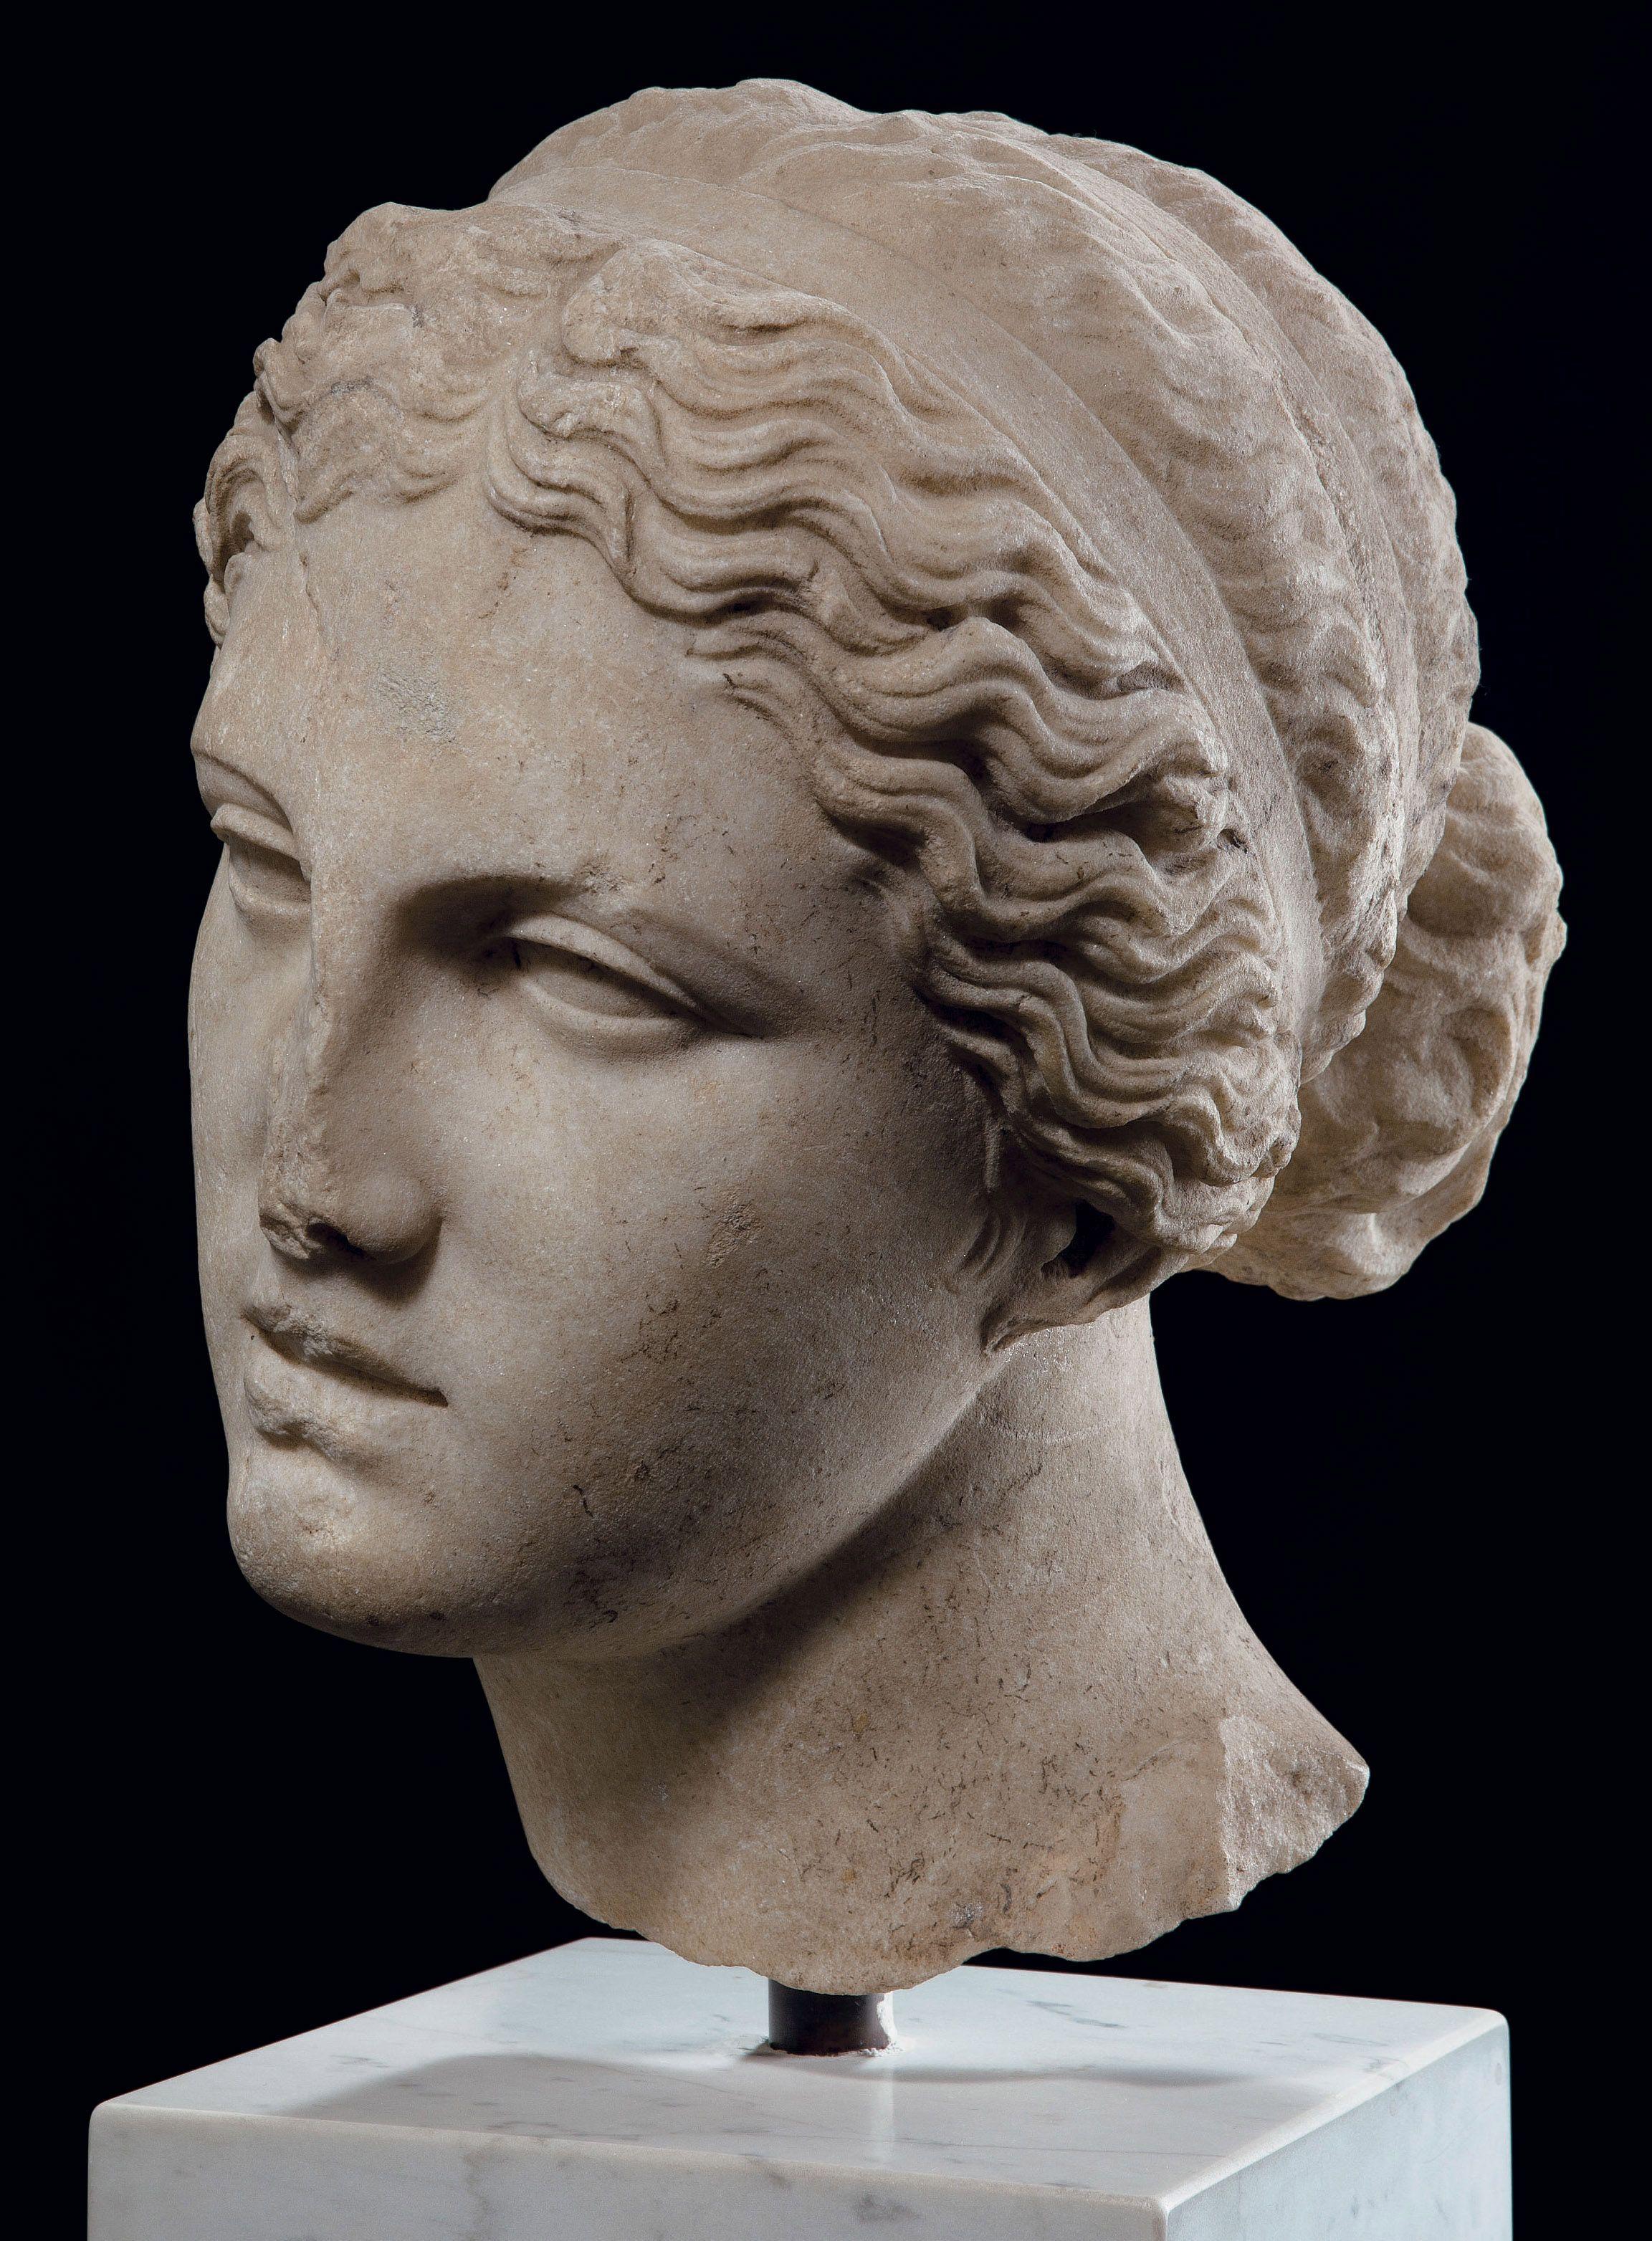 A ROMAN MARBLE HEAD OF APHRODITE | CIRCA 1ST-2ND CENTURY